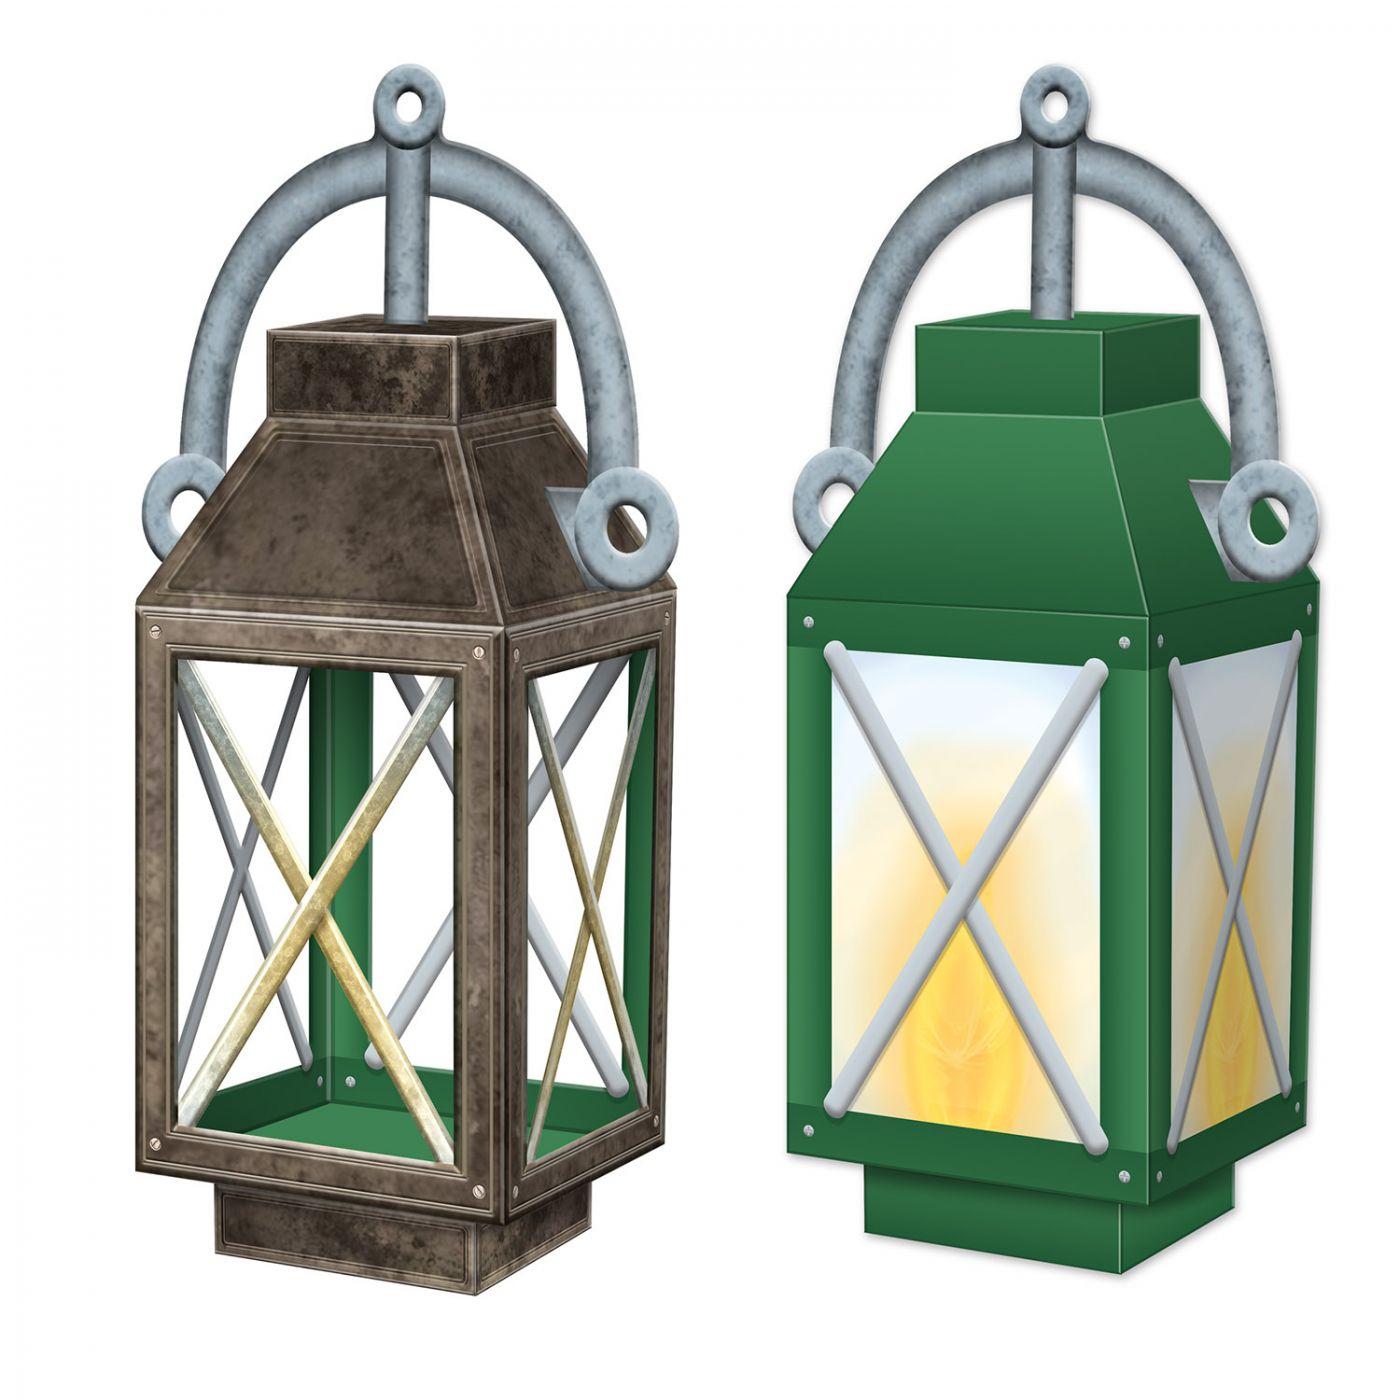 Image of 3-D Lantern Centerpiece